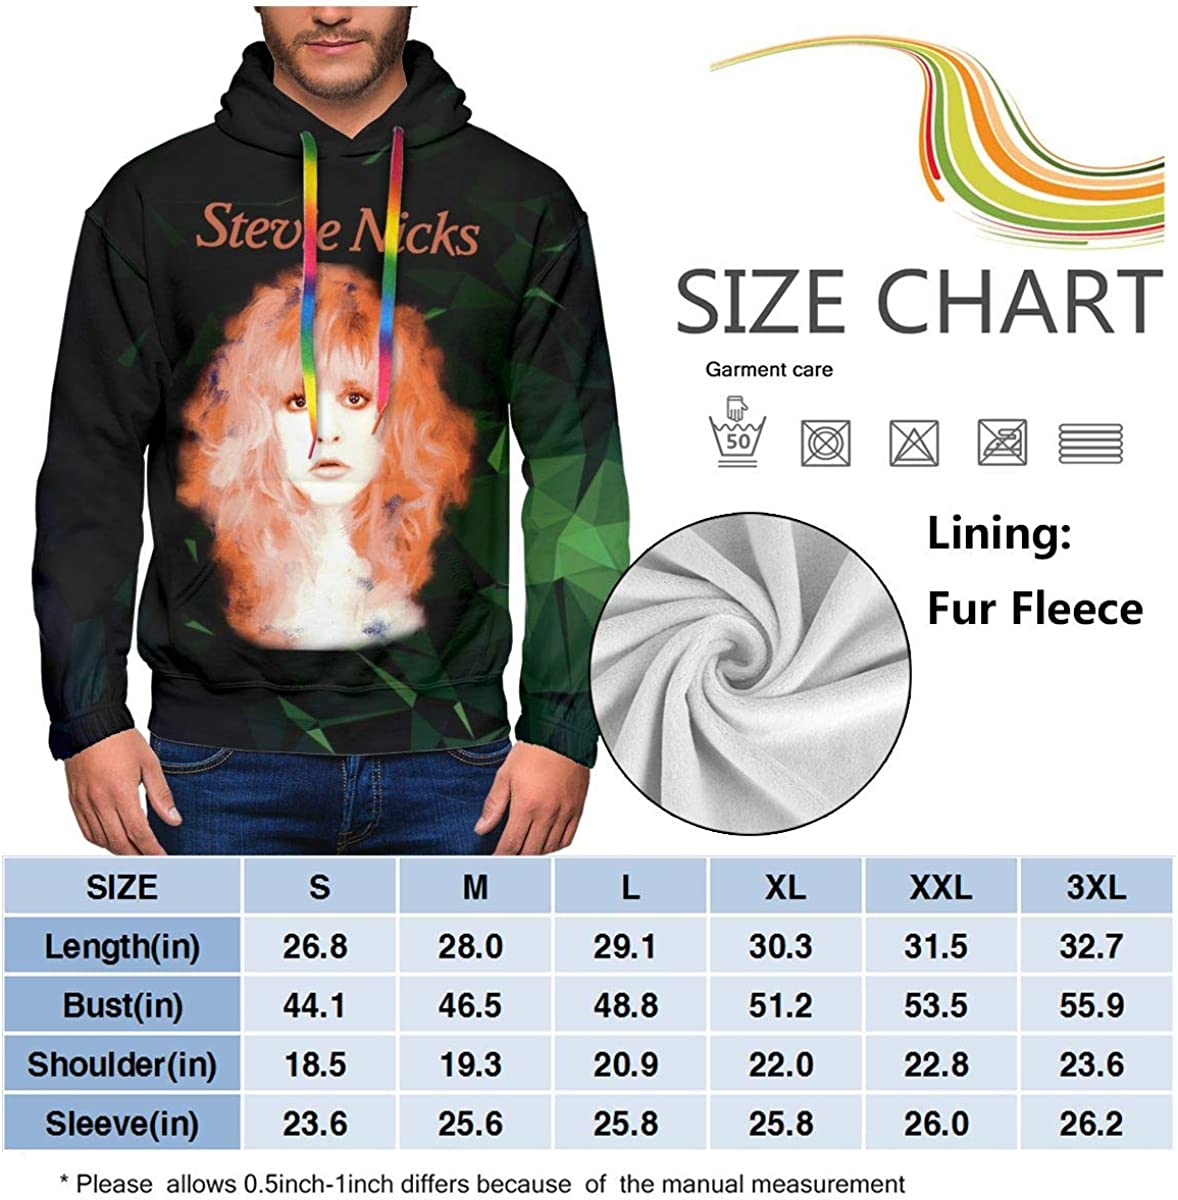 LarryCAdamson Stevie Nicks Mens Fashion Hip Hop Heavyweight Hoodies with Pocket